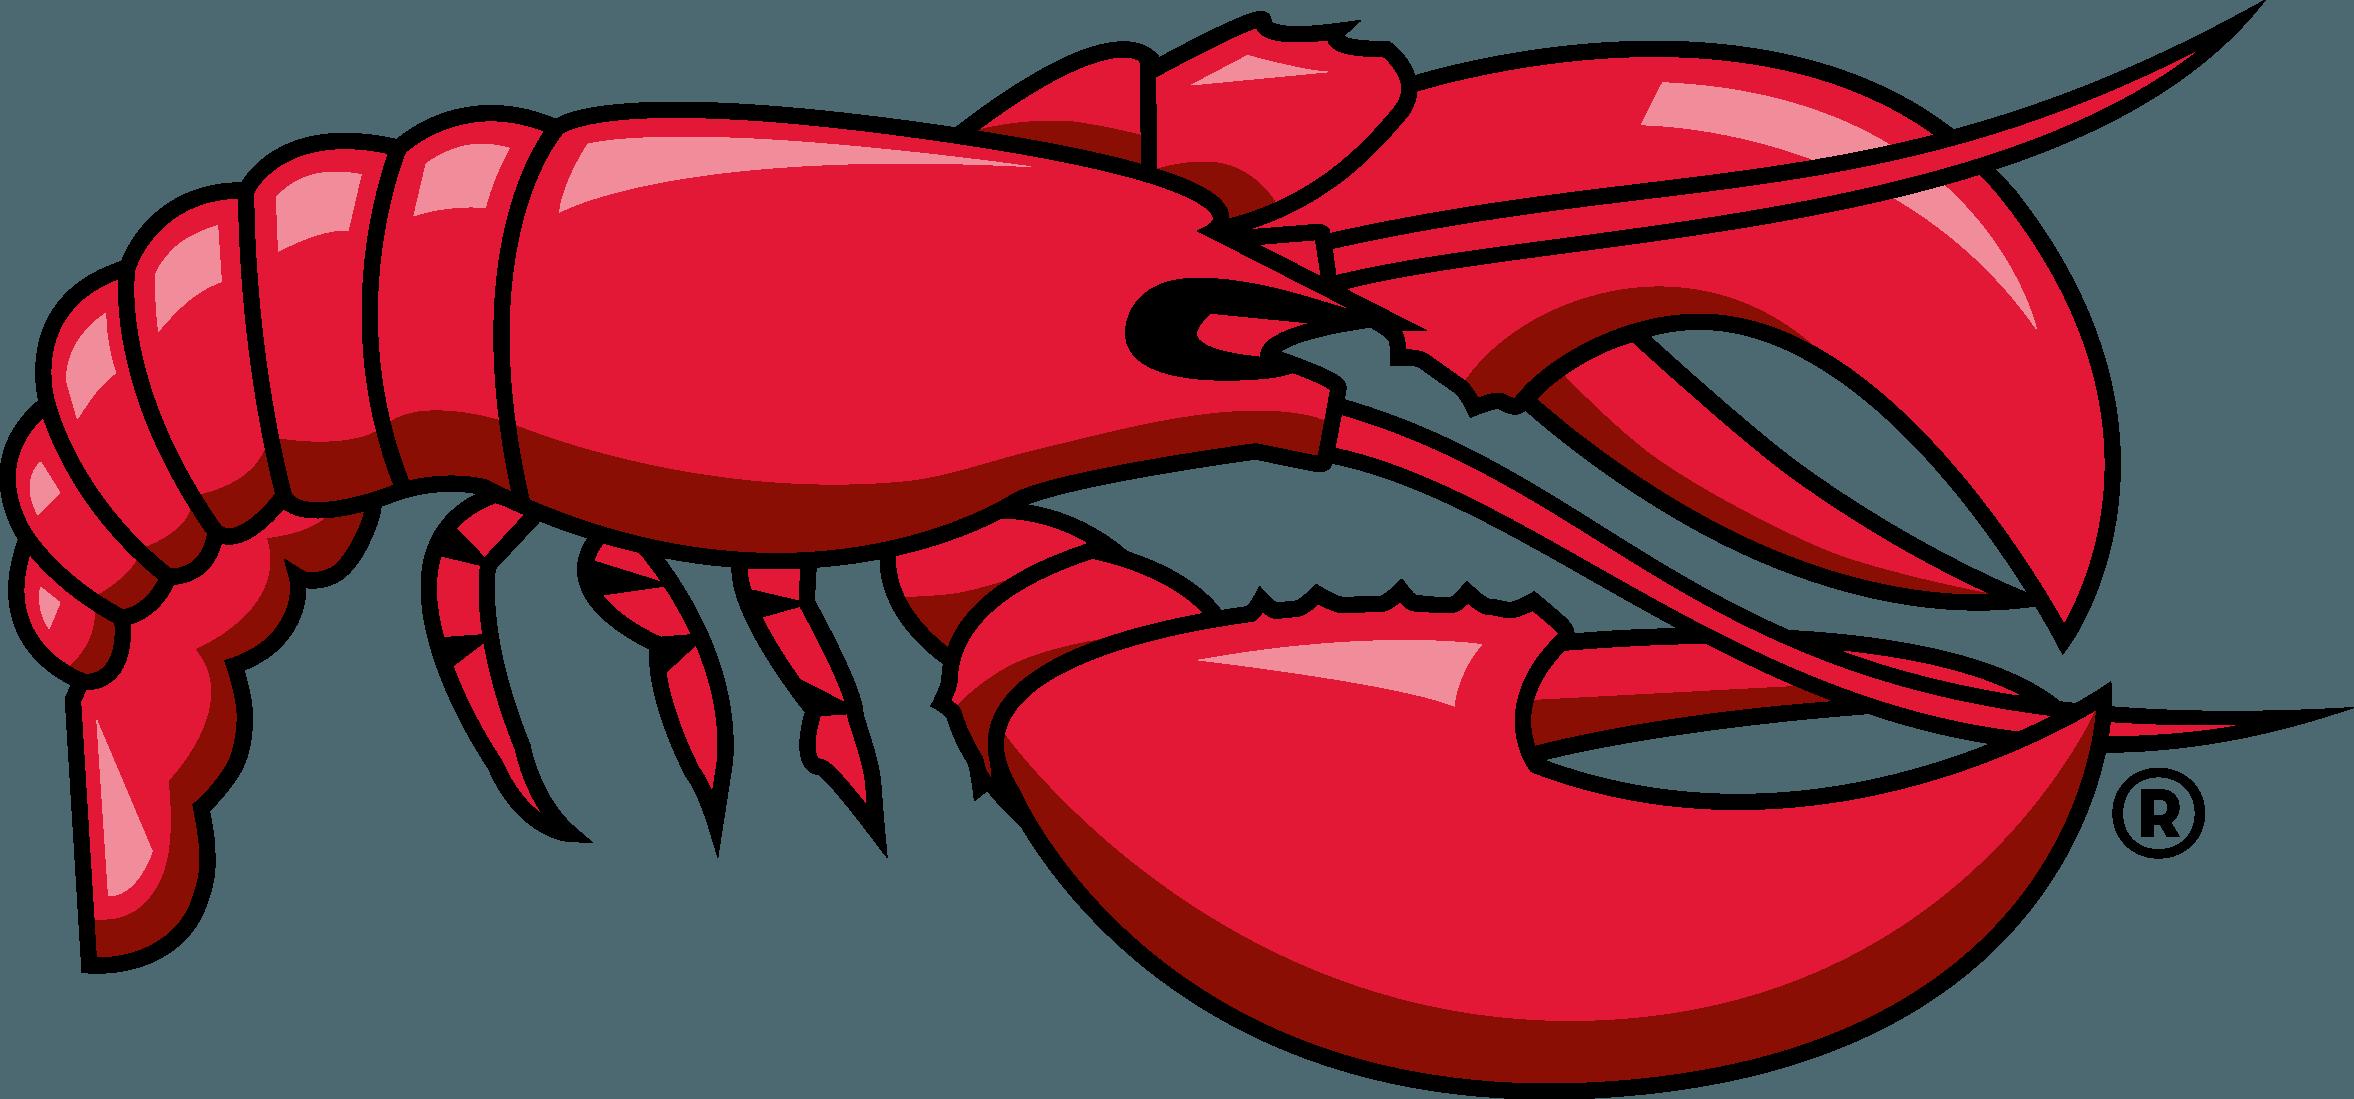 Red Lobster Logo Download Vector.